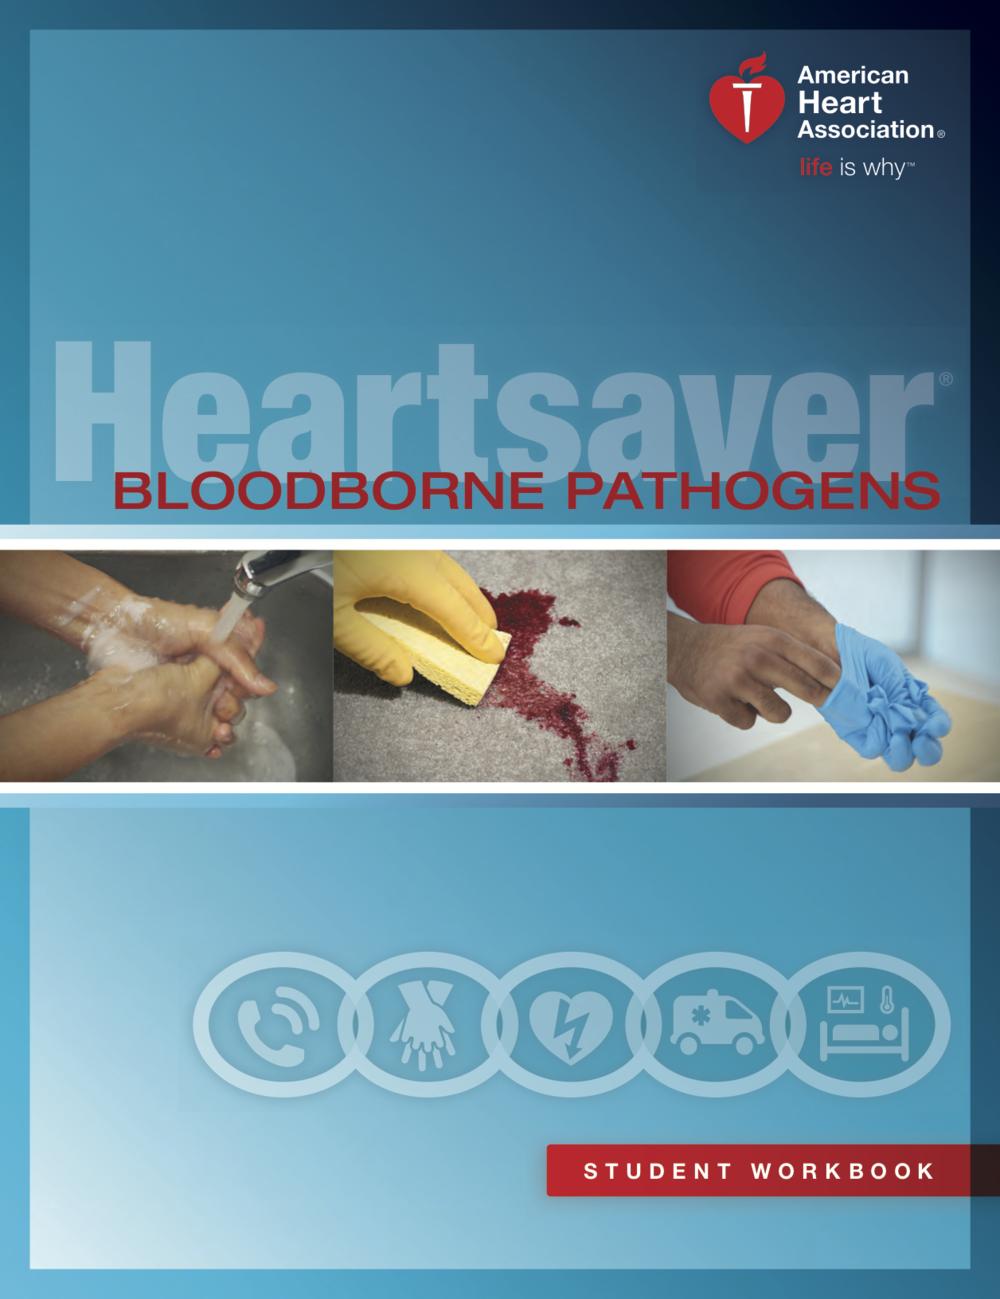 AHA_Heartsaver_Bloodborne_Pathogens.png